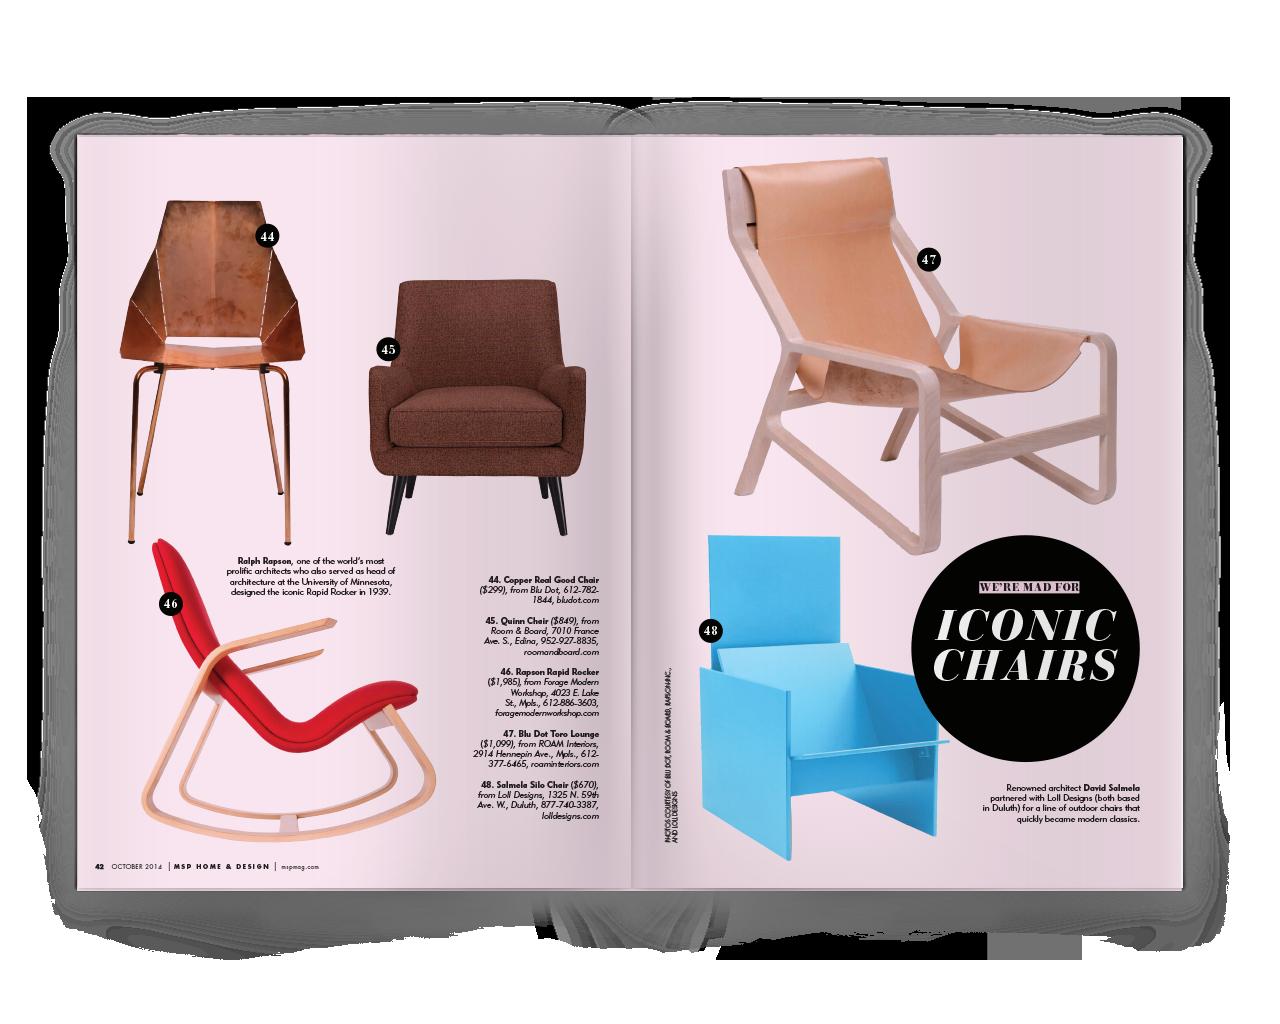 Creative Direction + Design by Liz Gardner for Mpls. St. Paul magazine